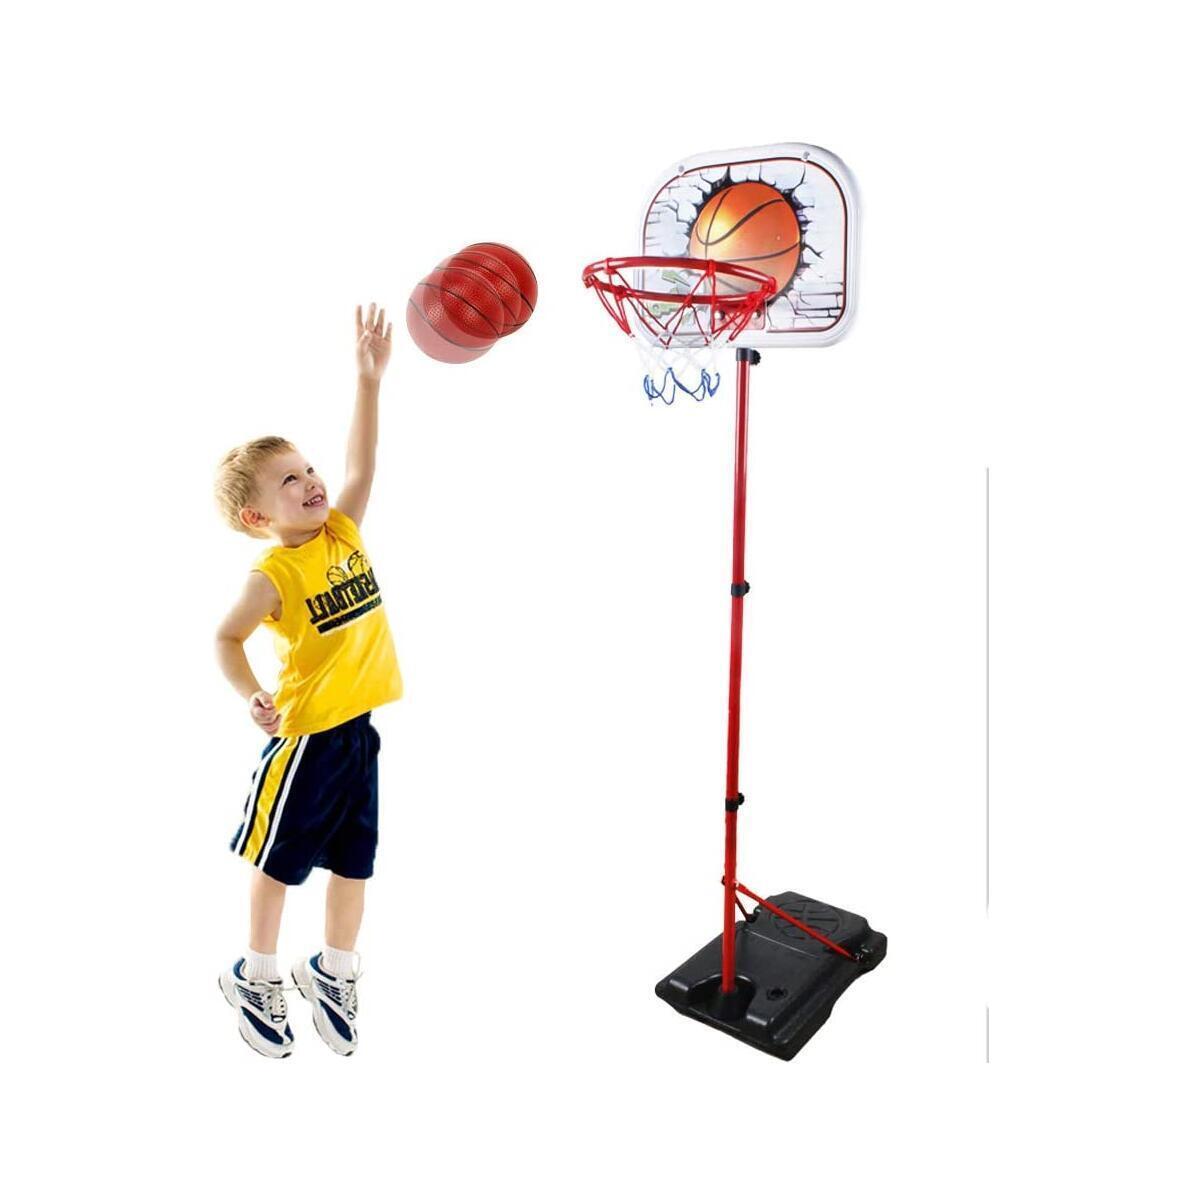 Basketball Hoop for Kids - Kids Basketball Goal Toddlers Basketball Hoop Adjustable Height Mini Basketball Hoop for 3 years old